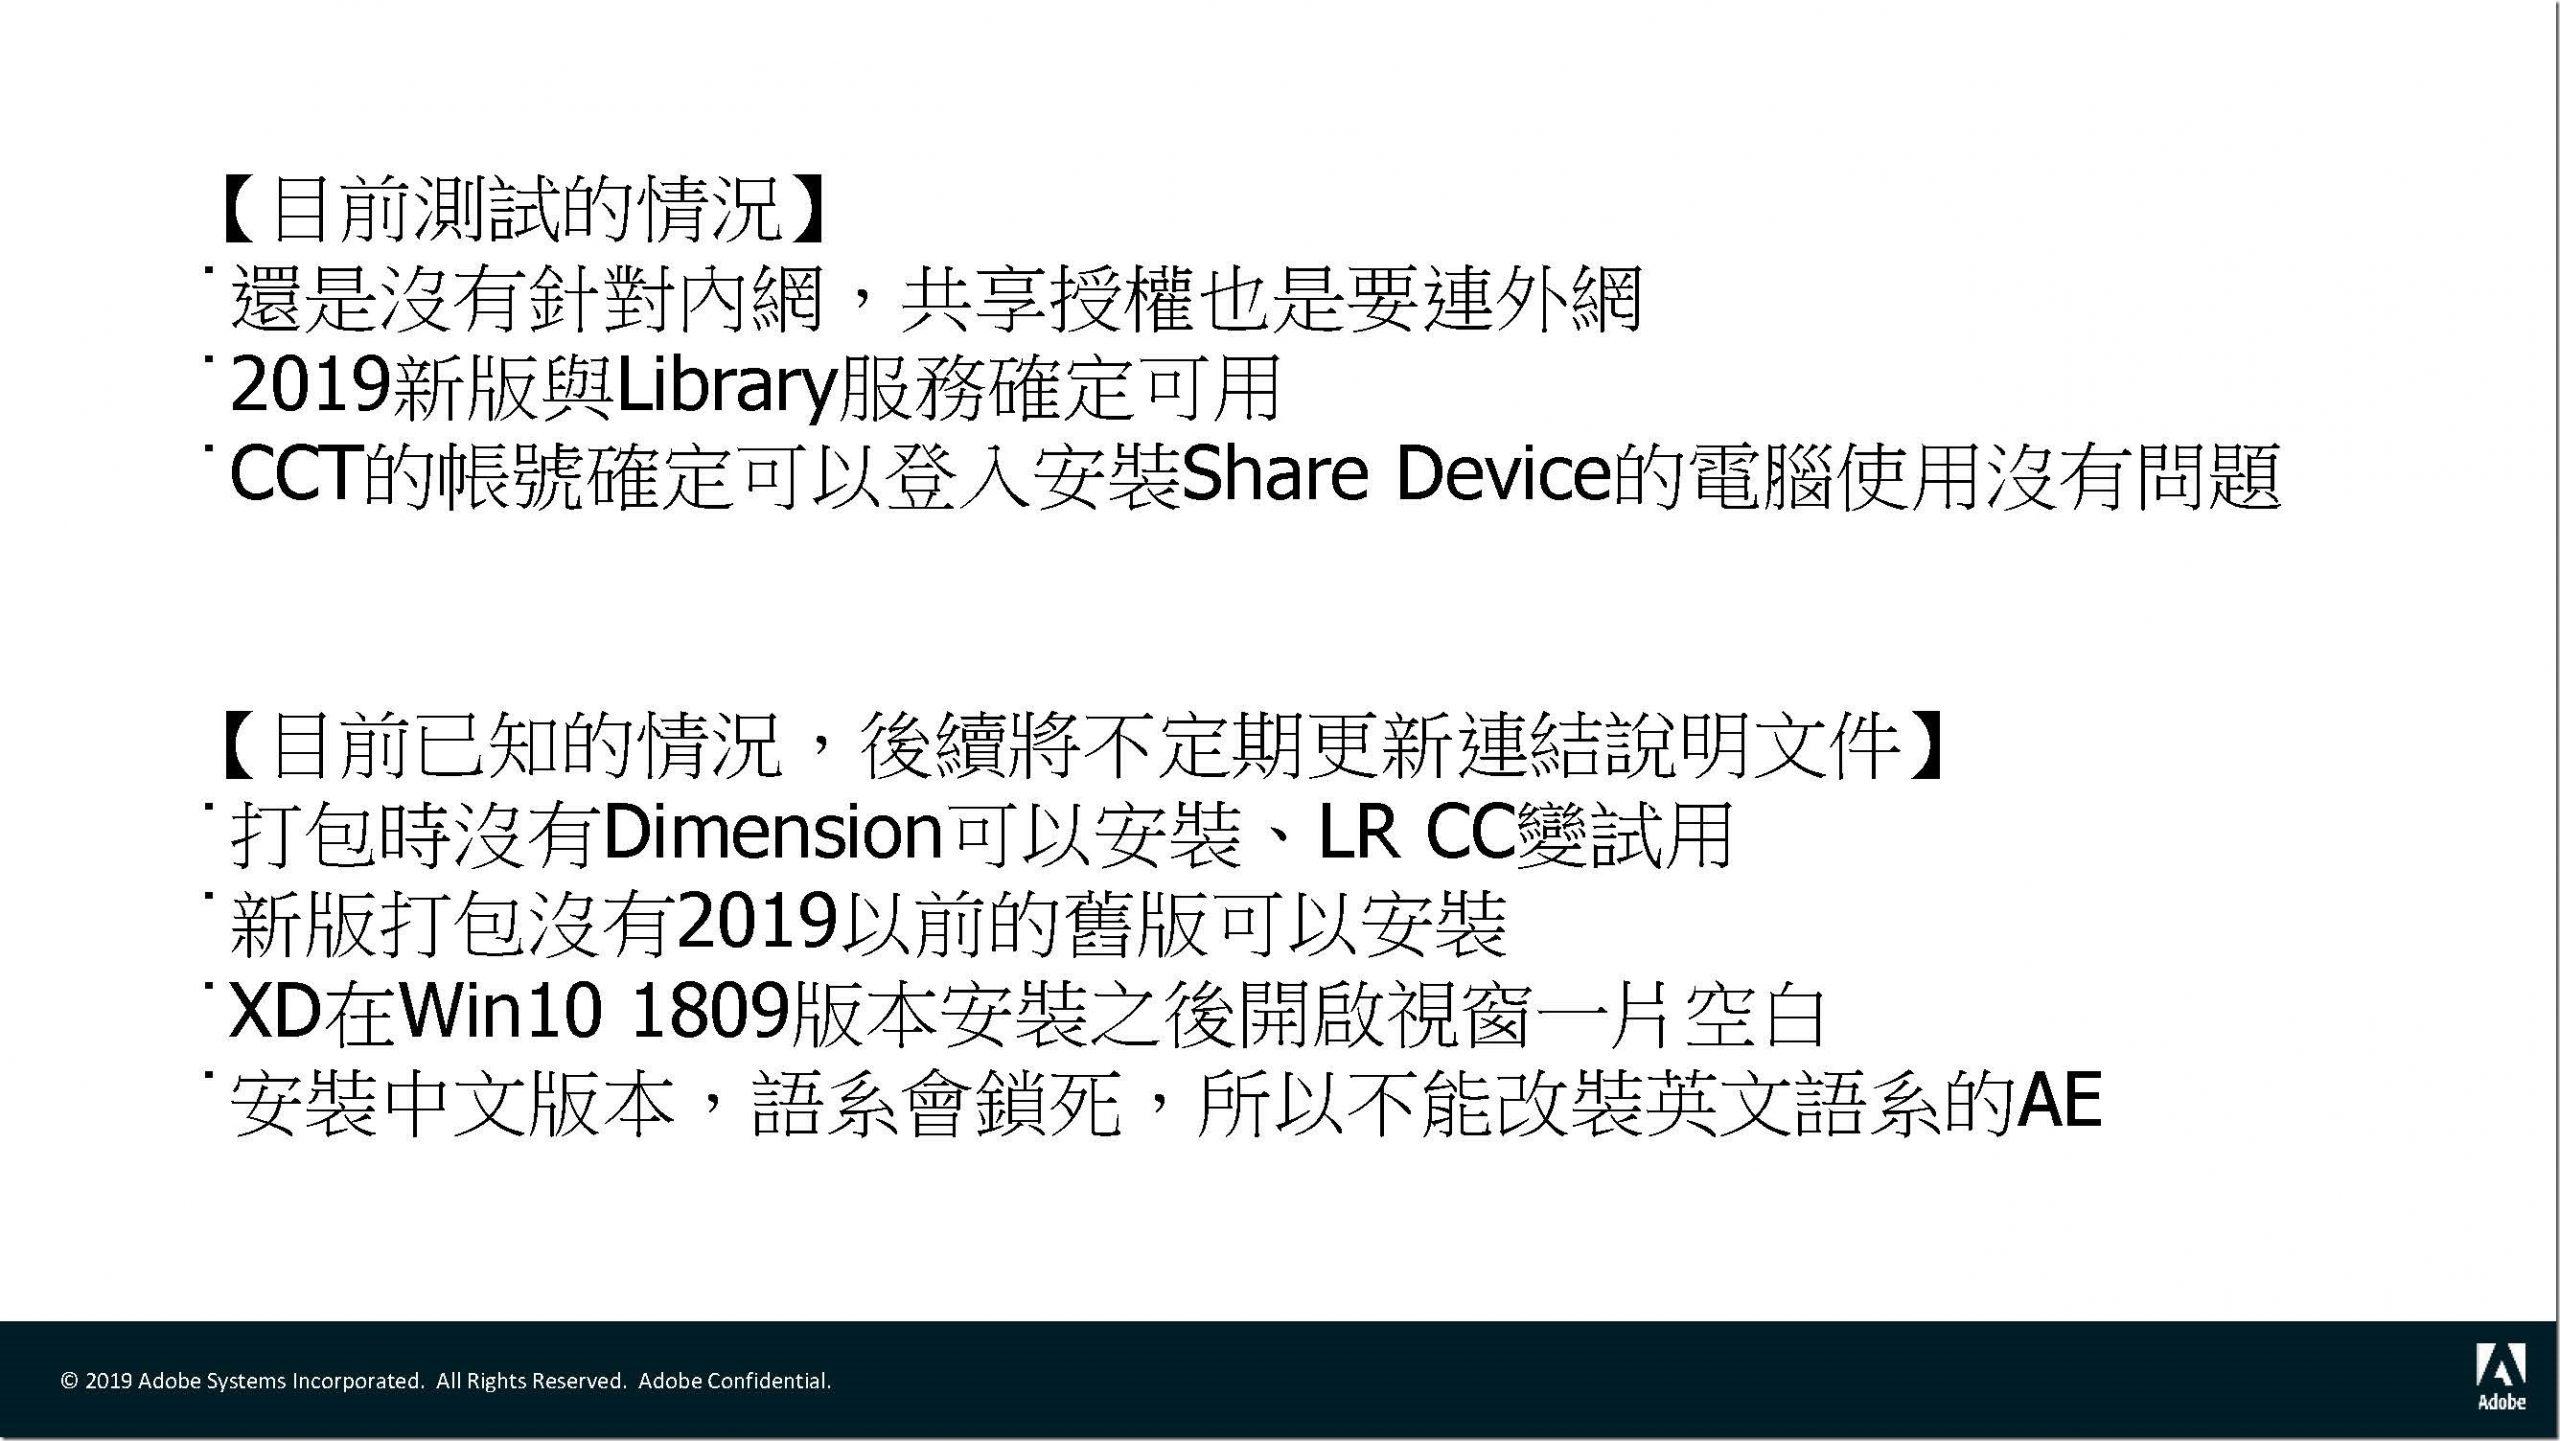 Adobe 共用裝置授權安裝指南_教育通用_頁面_30